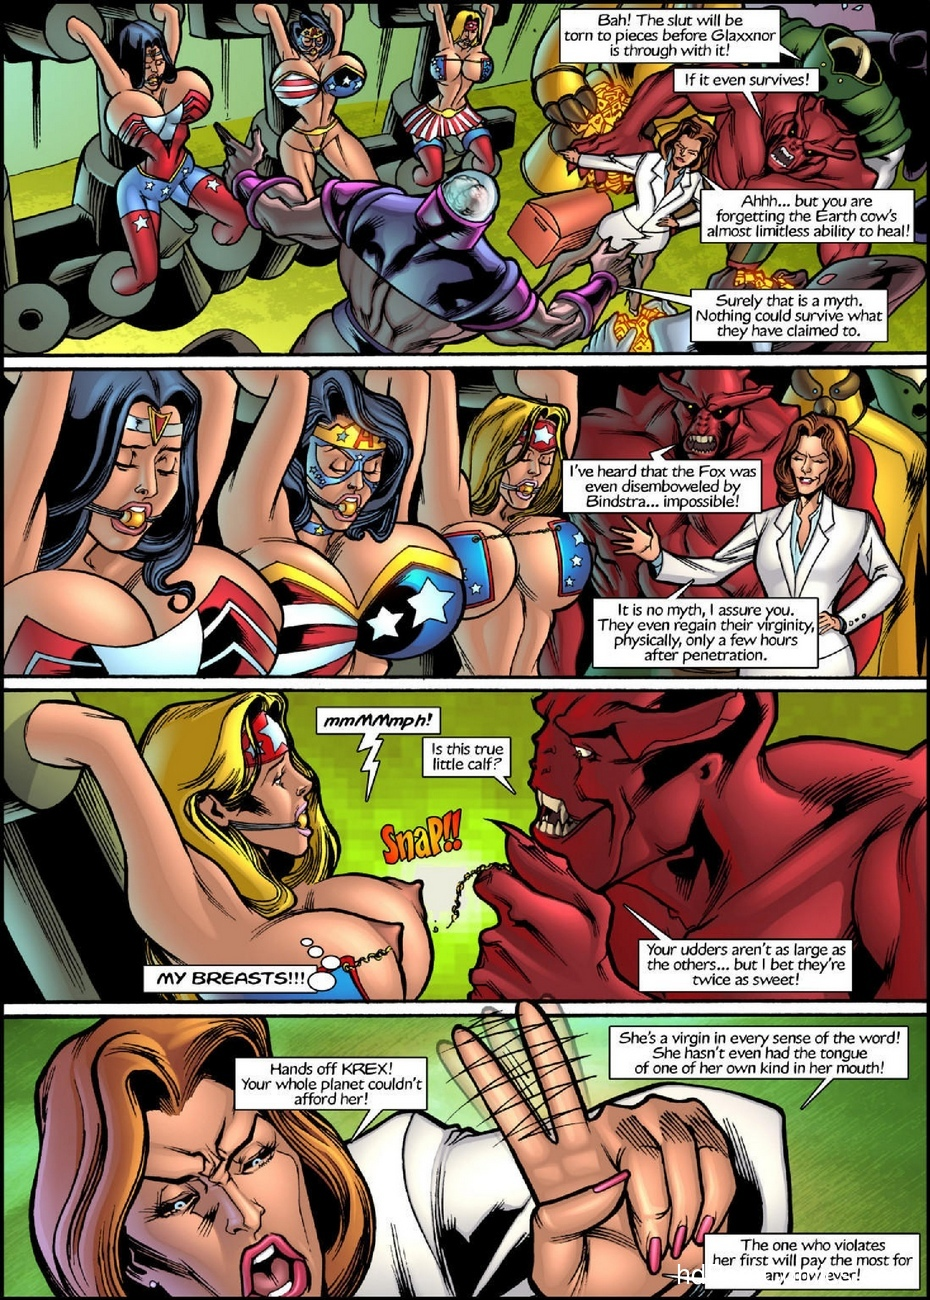 Freedom Stars - Cattle Call 1 20 free sex comic